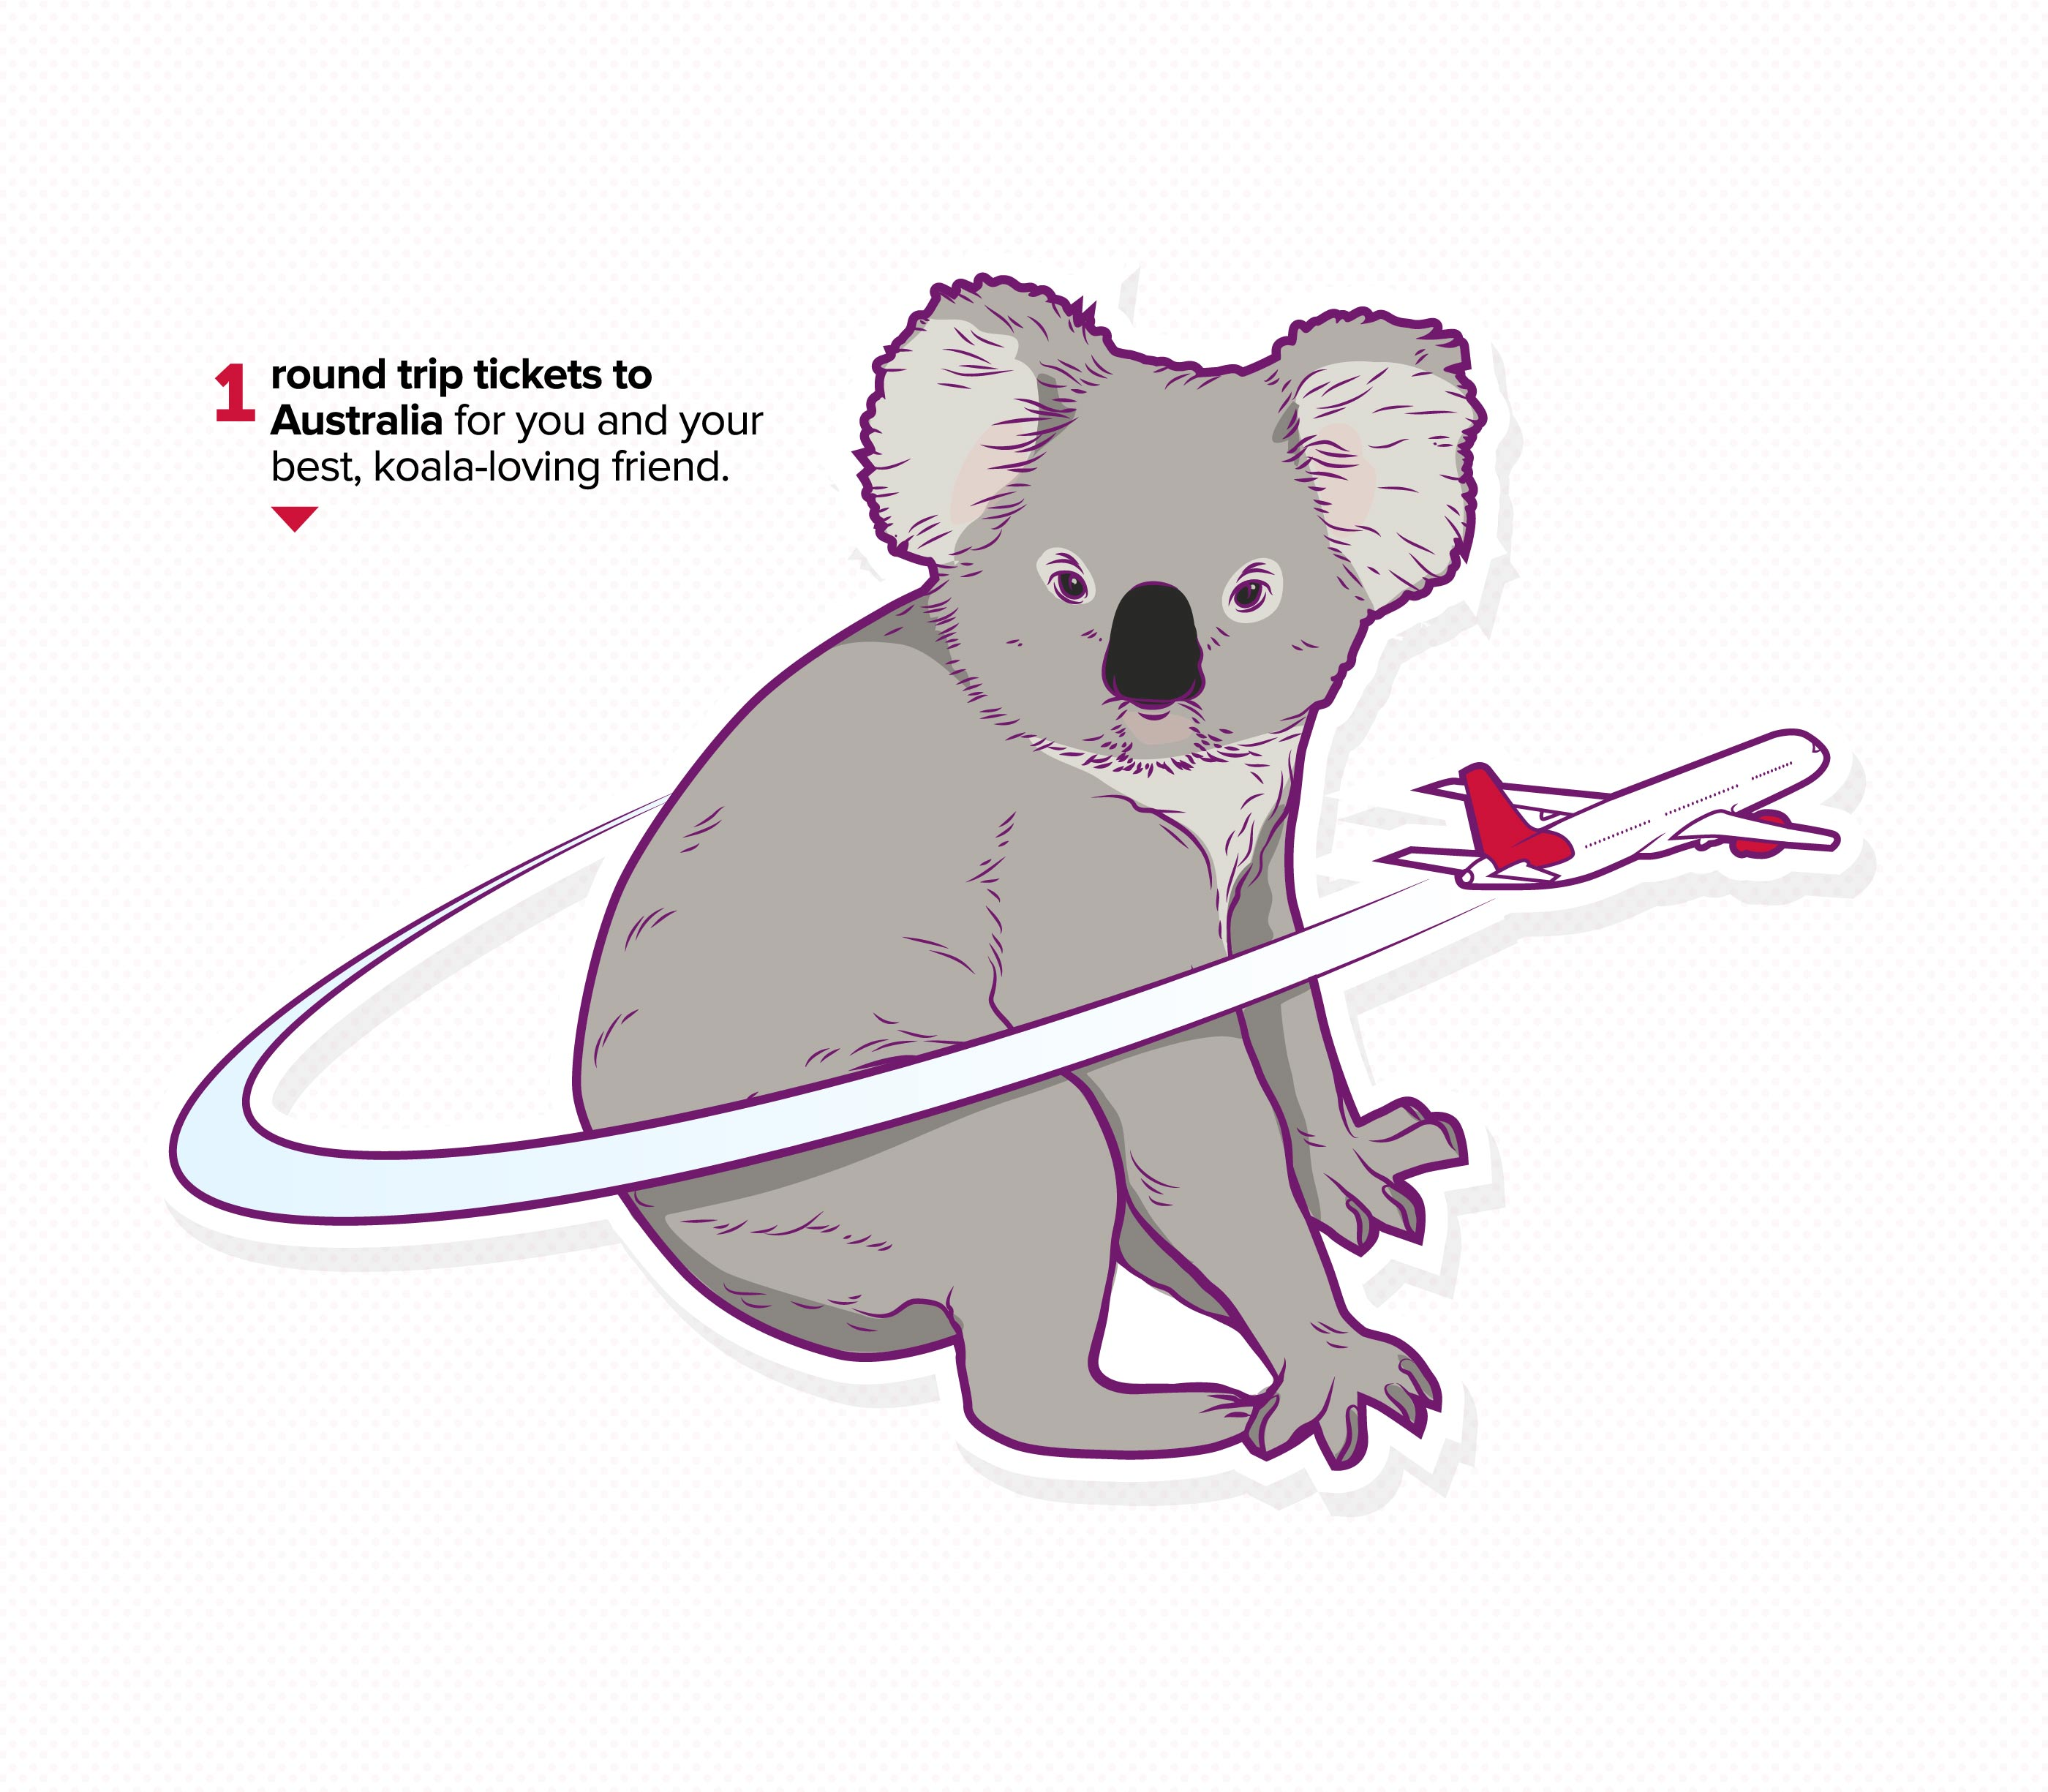 Virgin Mobile, Infographic Detail, Koala bear and airplane